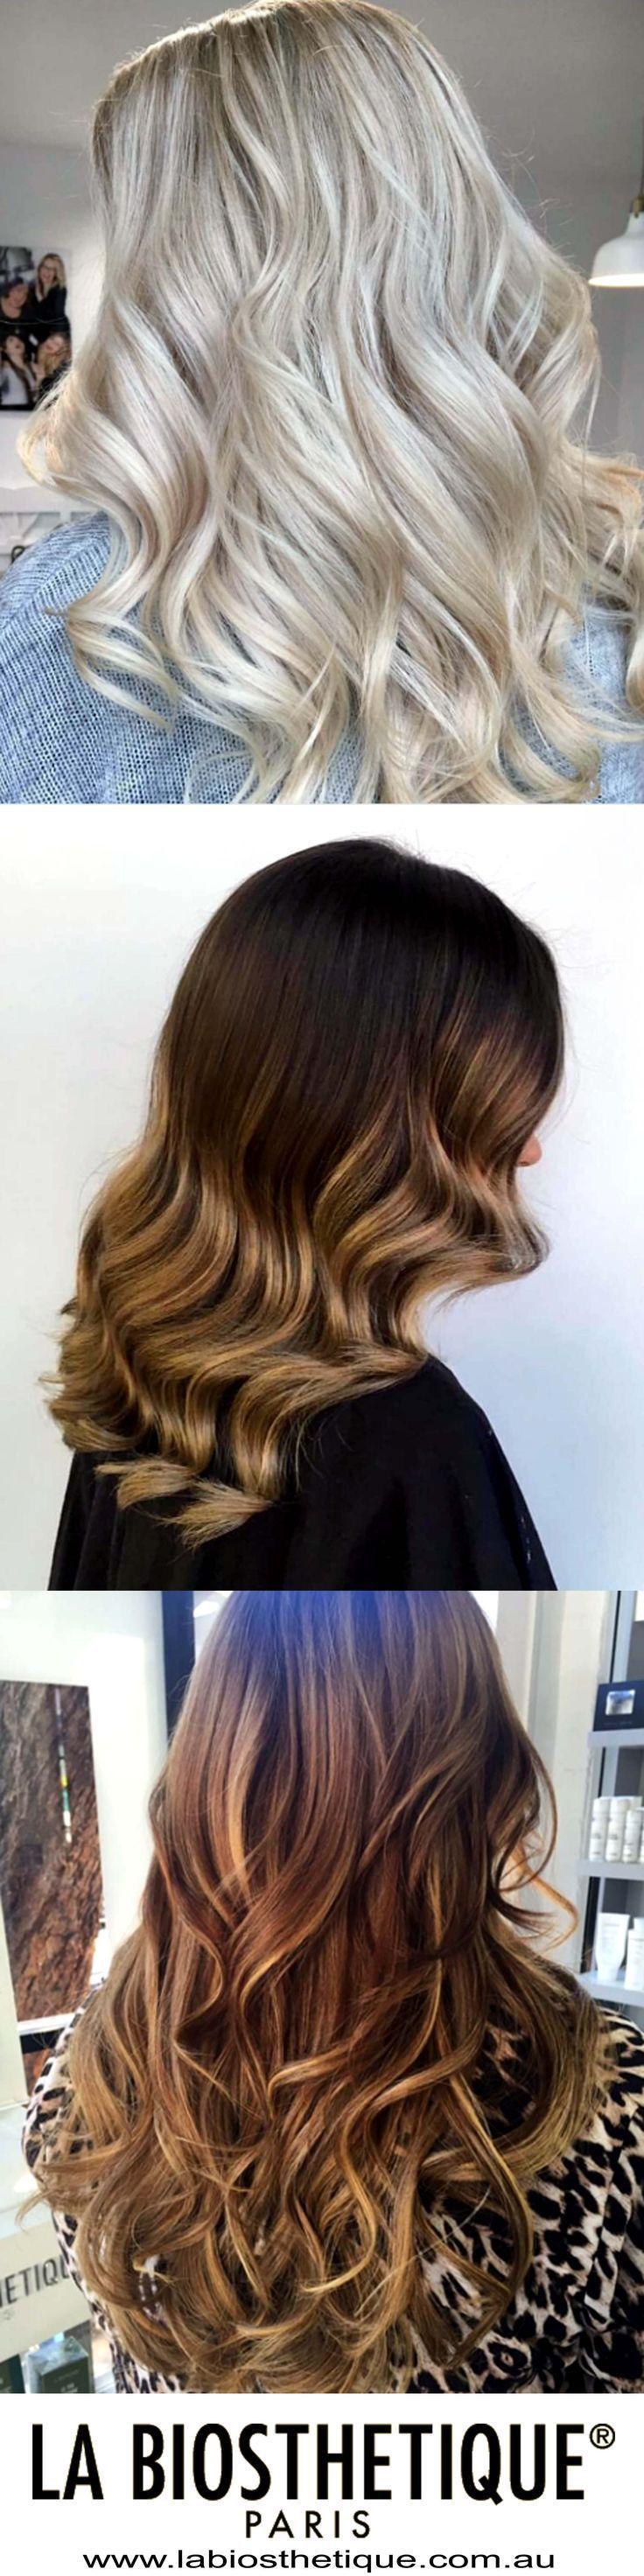 Waves hairstyles. Hairstyles │Short Hairstyles │Cute Girl Hairstyles │New Hair ...